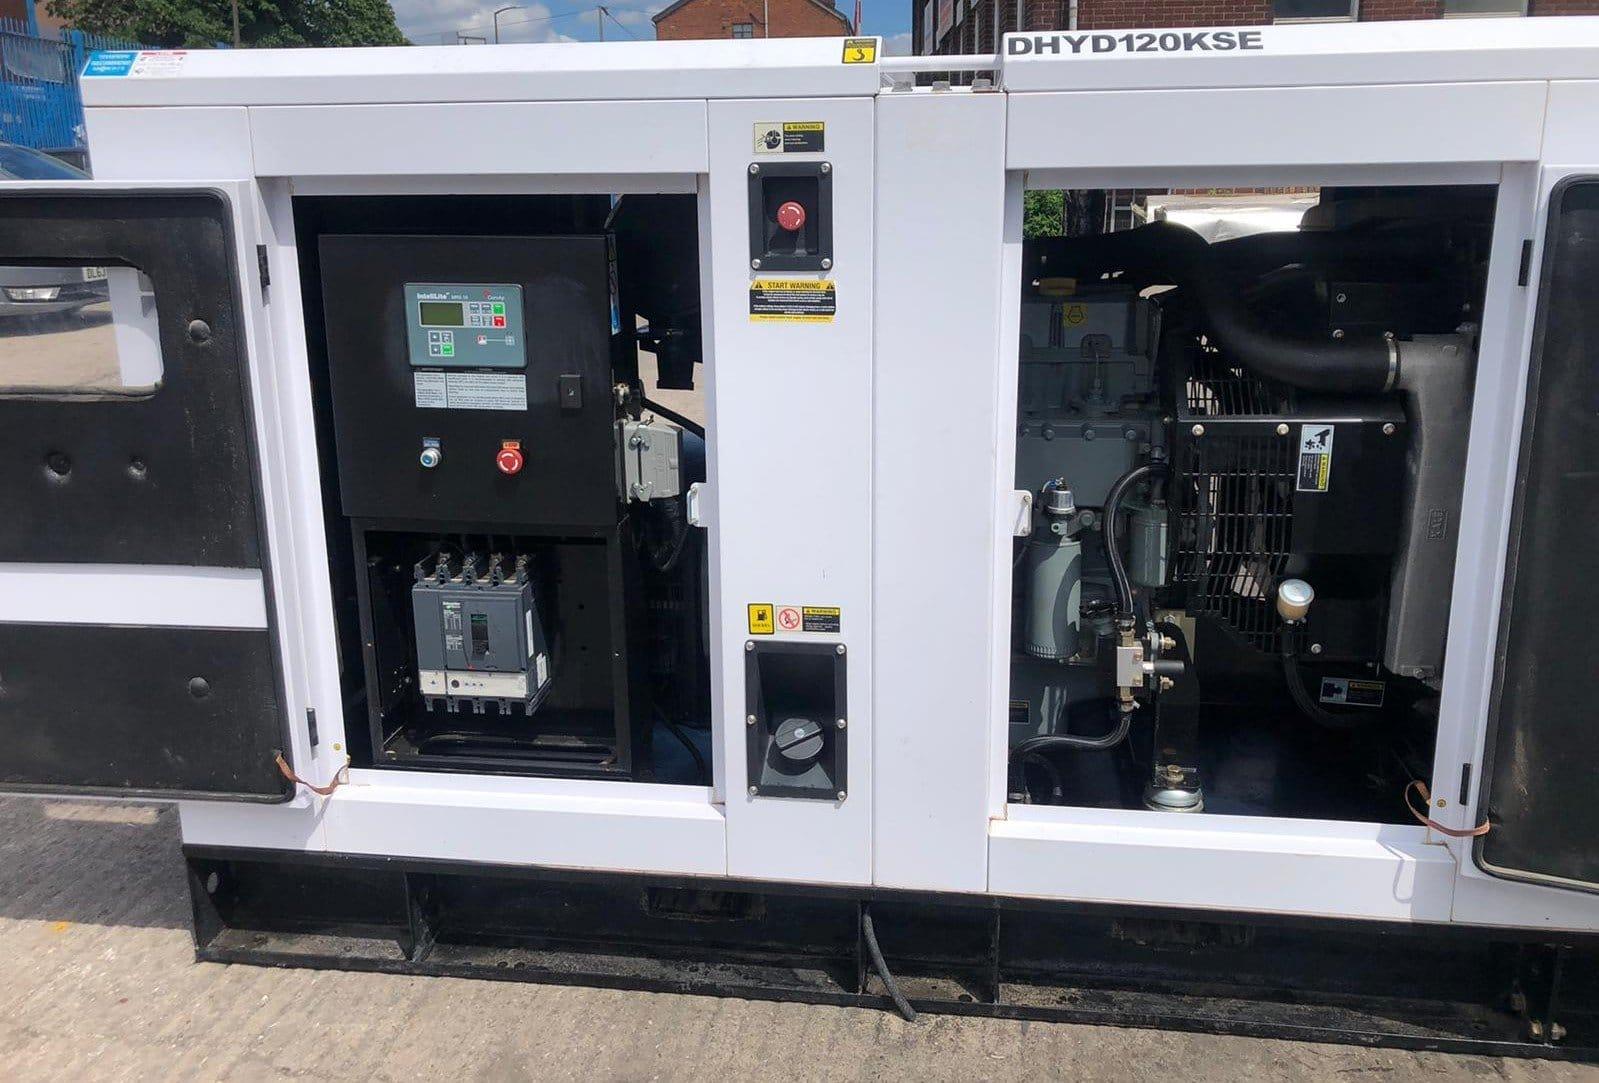 120 kVA Hyundai DHYD120KSE Deutz/Stamford Acoustic Generator inside